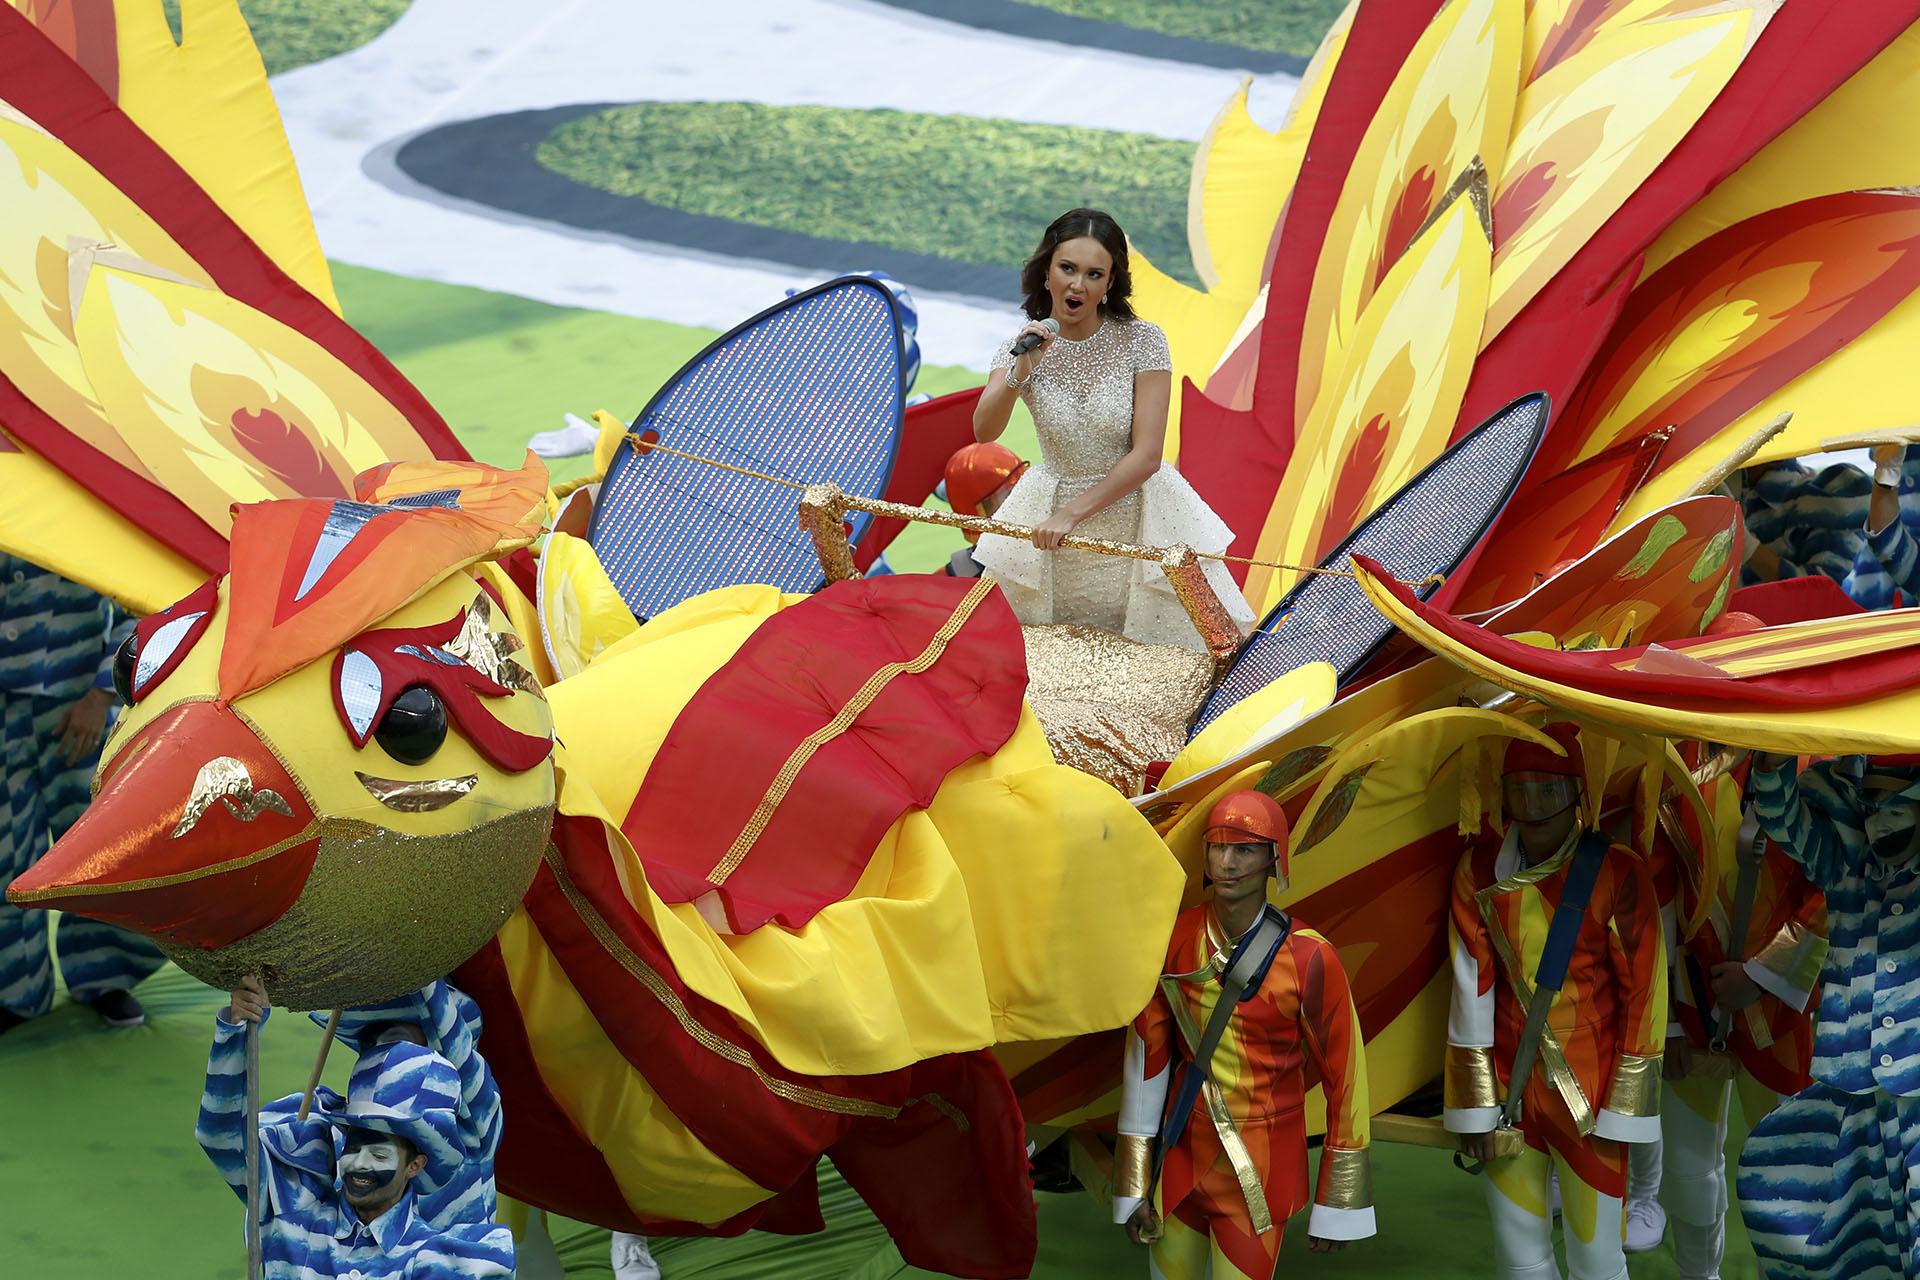 Lasoprano rusa Aida Garifullina singsingresó sobre un ave artificial luego de que Robbie Williams cantara su primera canción(AP Photo/Victor Caivano)